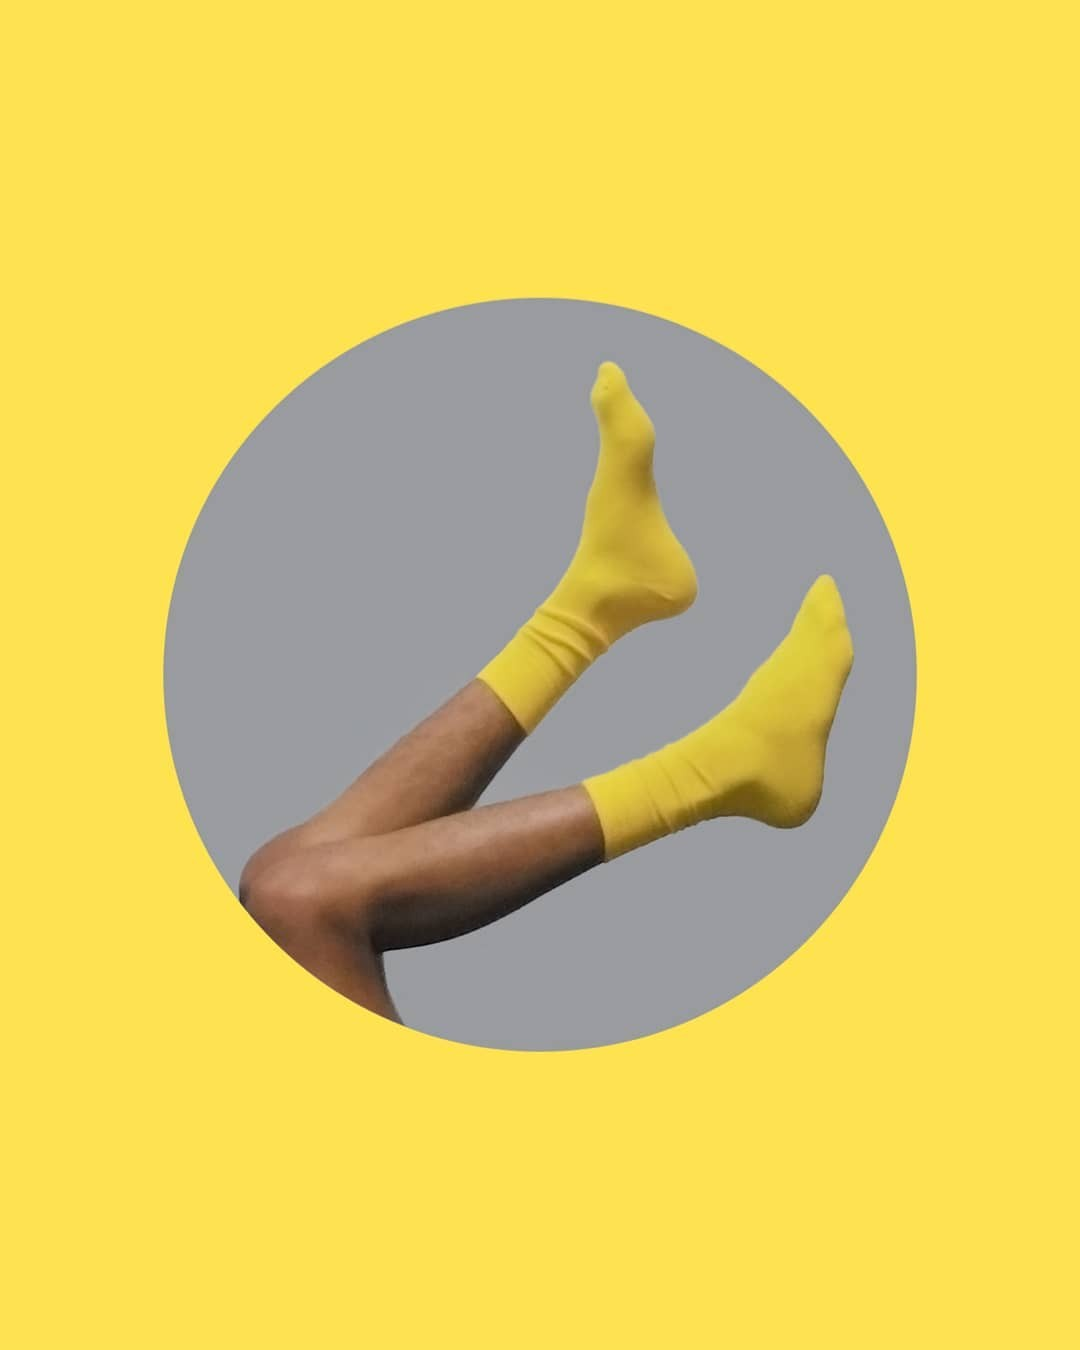 2021 socks trends in Dalma mall